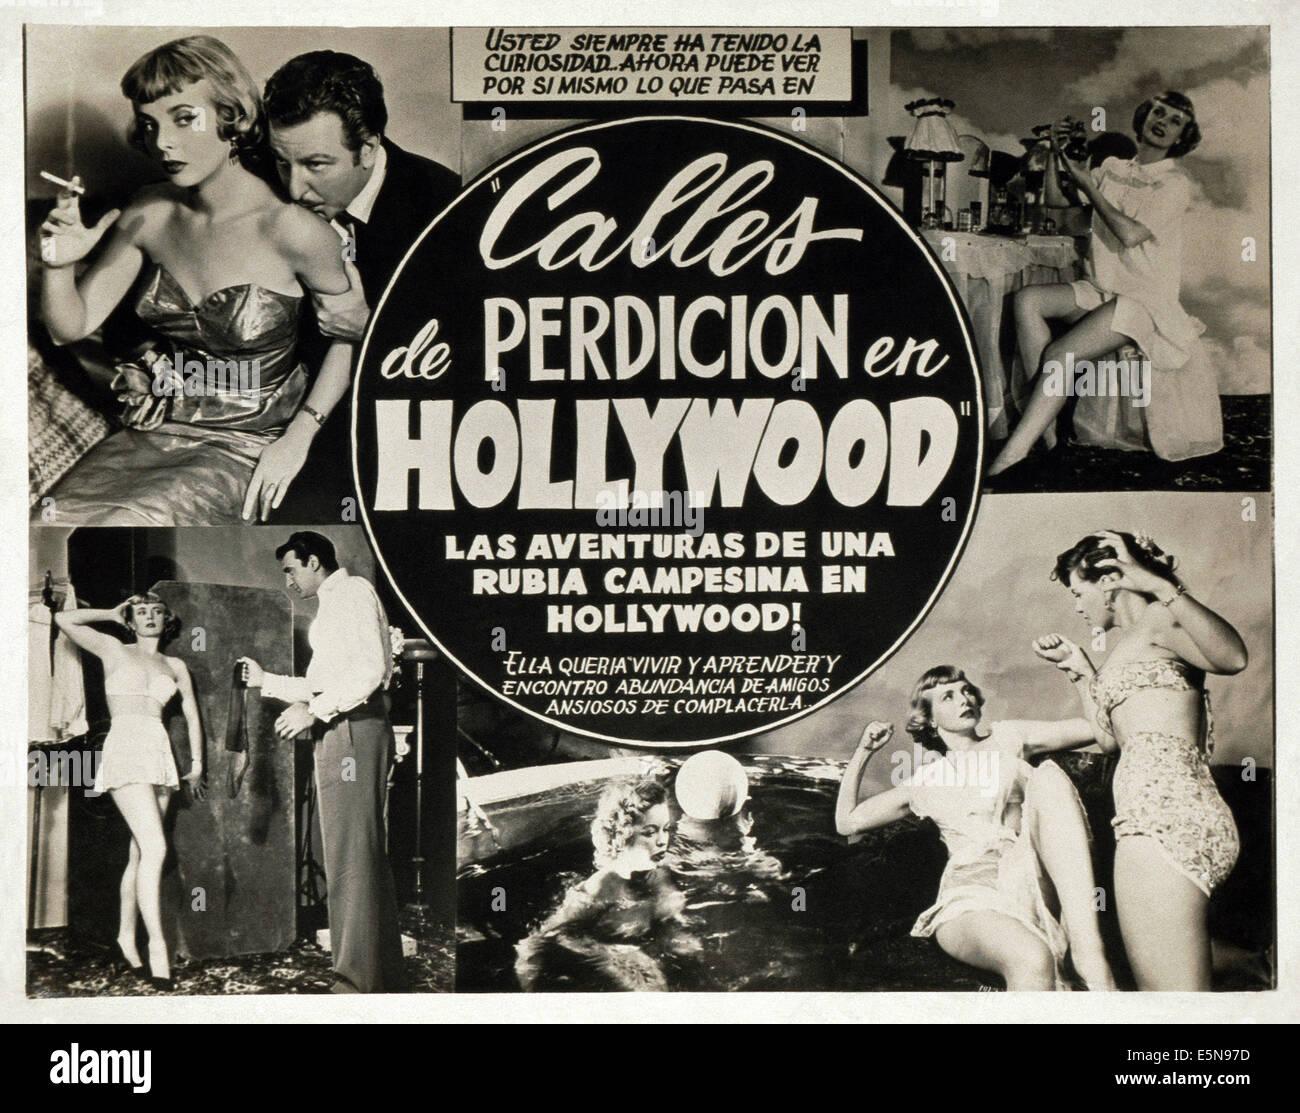 CALLES DE PERDICION EN HOLLYWOOD, (aka Strassen der Sünde IN HOLLYWOOD), ca. 1950er Jahre Stockbild